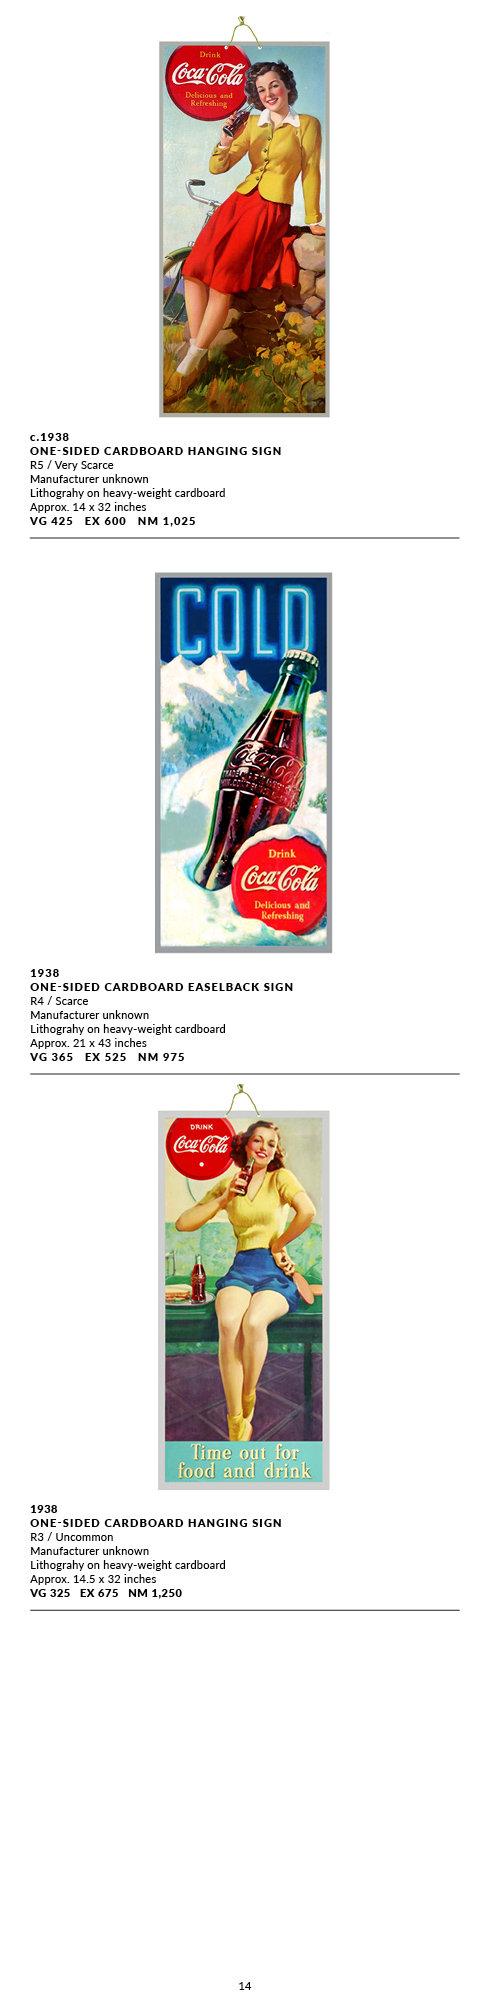 1904-1939RectCardboards (2021)14.jpg